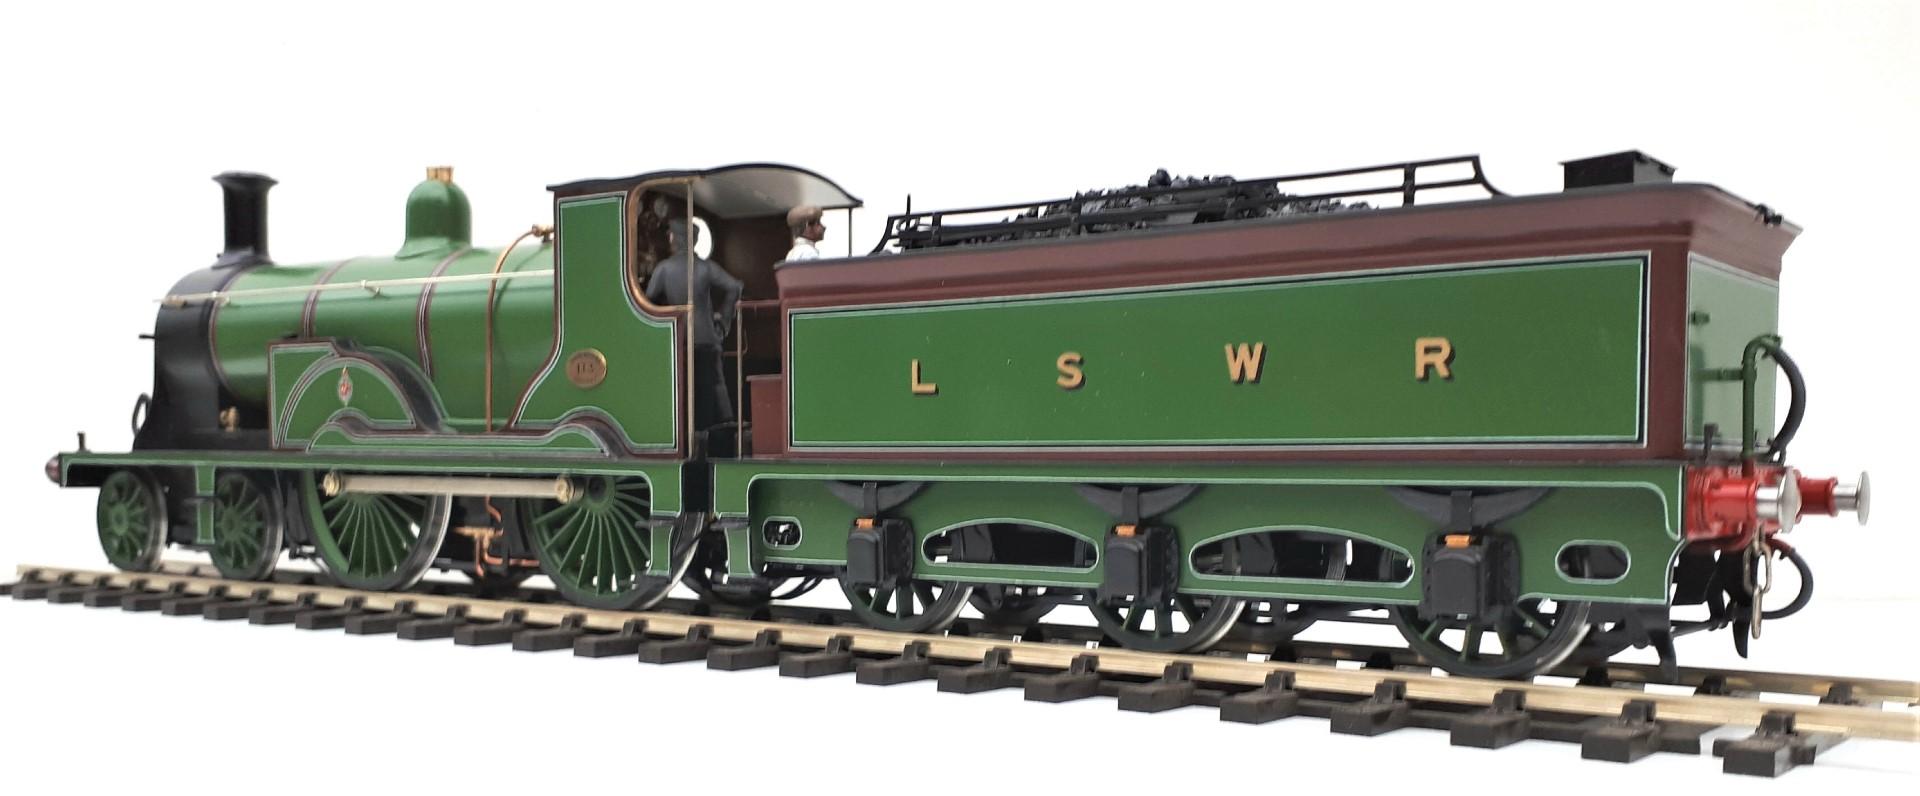 LSWR Greyhound no. 113